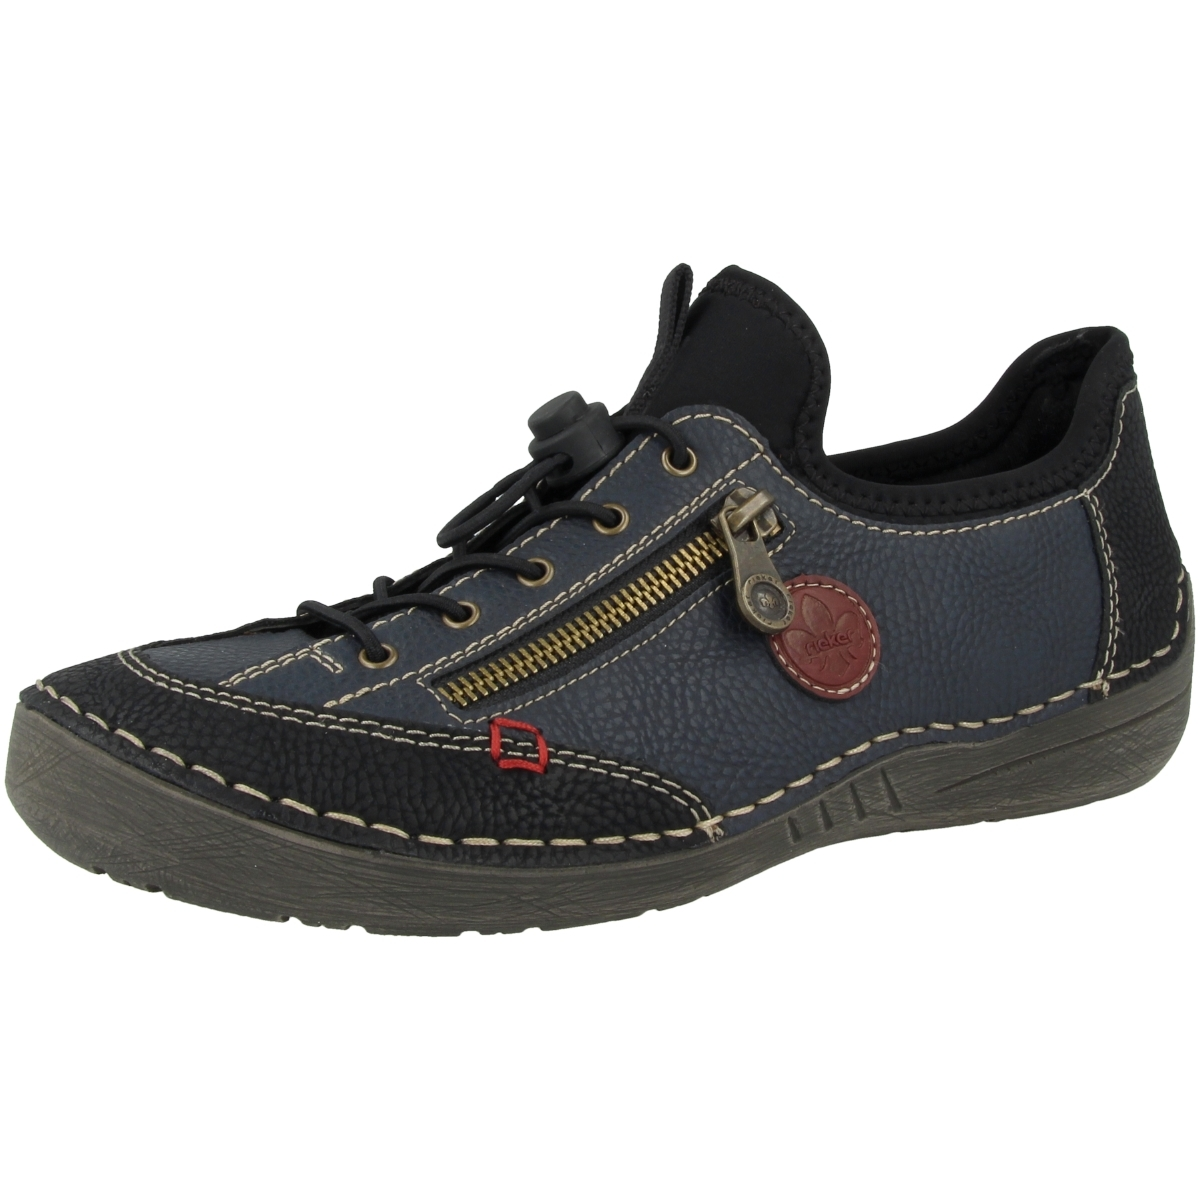 Rieker Women Damen Antistress Sneaker Women Freizeit Hiking Halbschuhe 52563